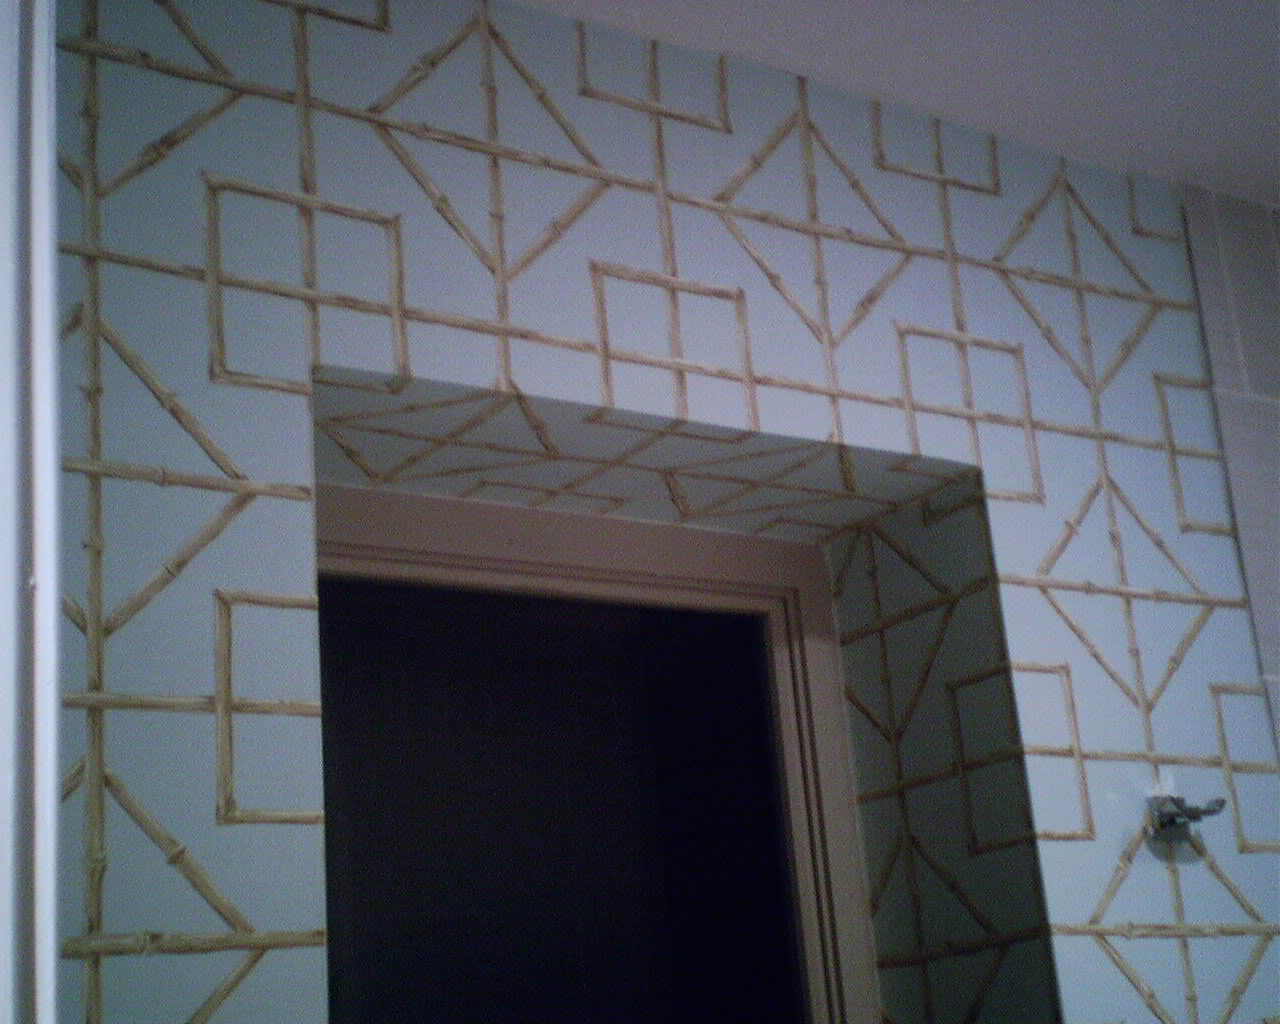 Centering a trellis pattern on a window wallpaperlady 39 s blog for Window trellis design